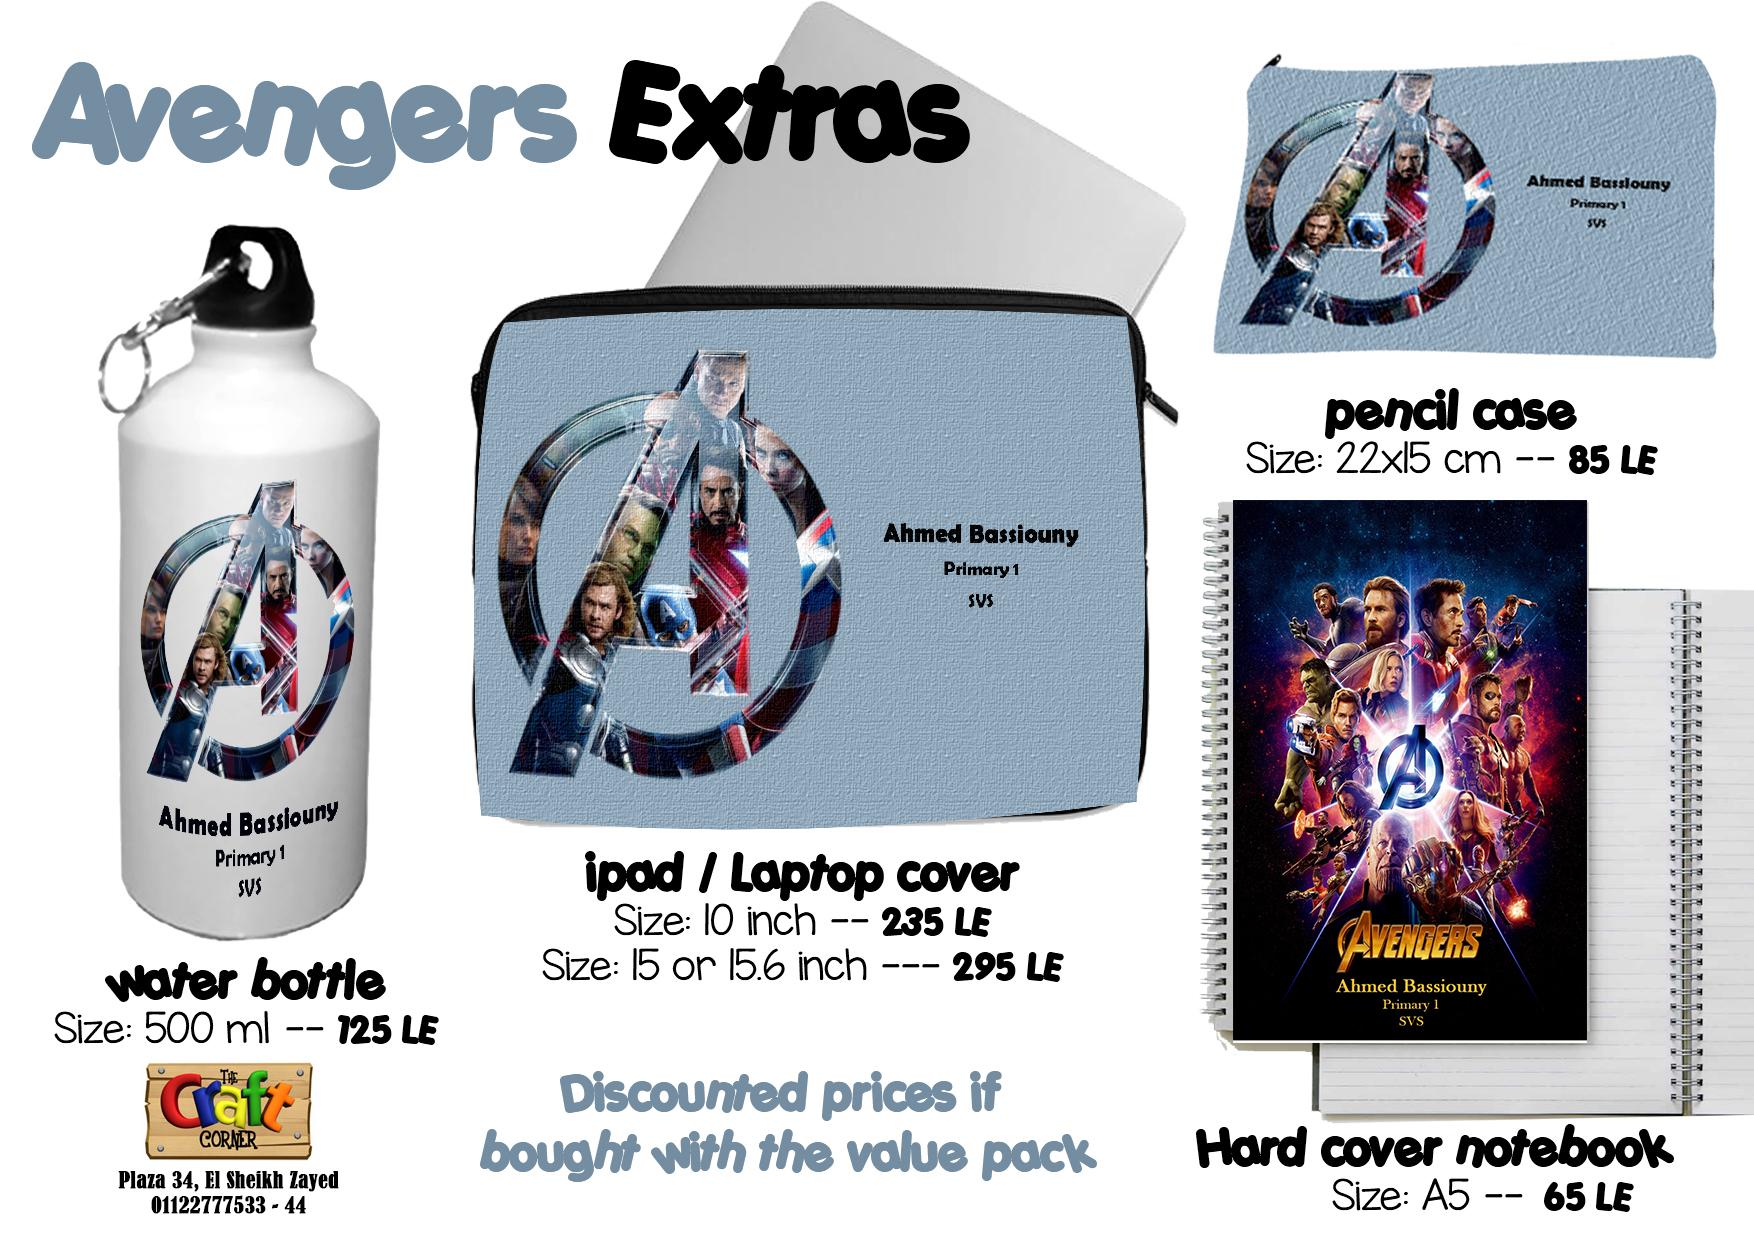 Avengers Extras